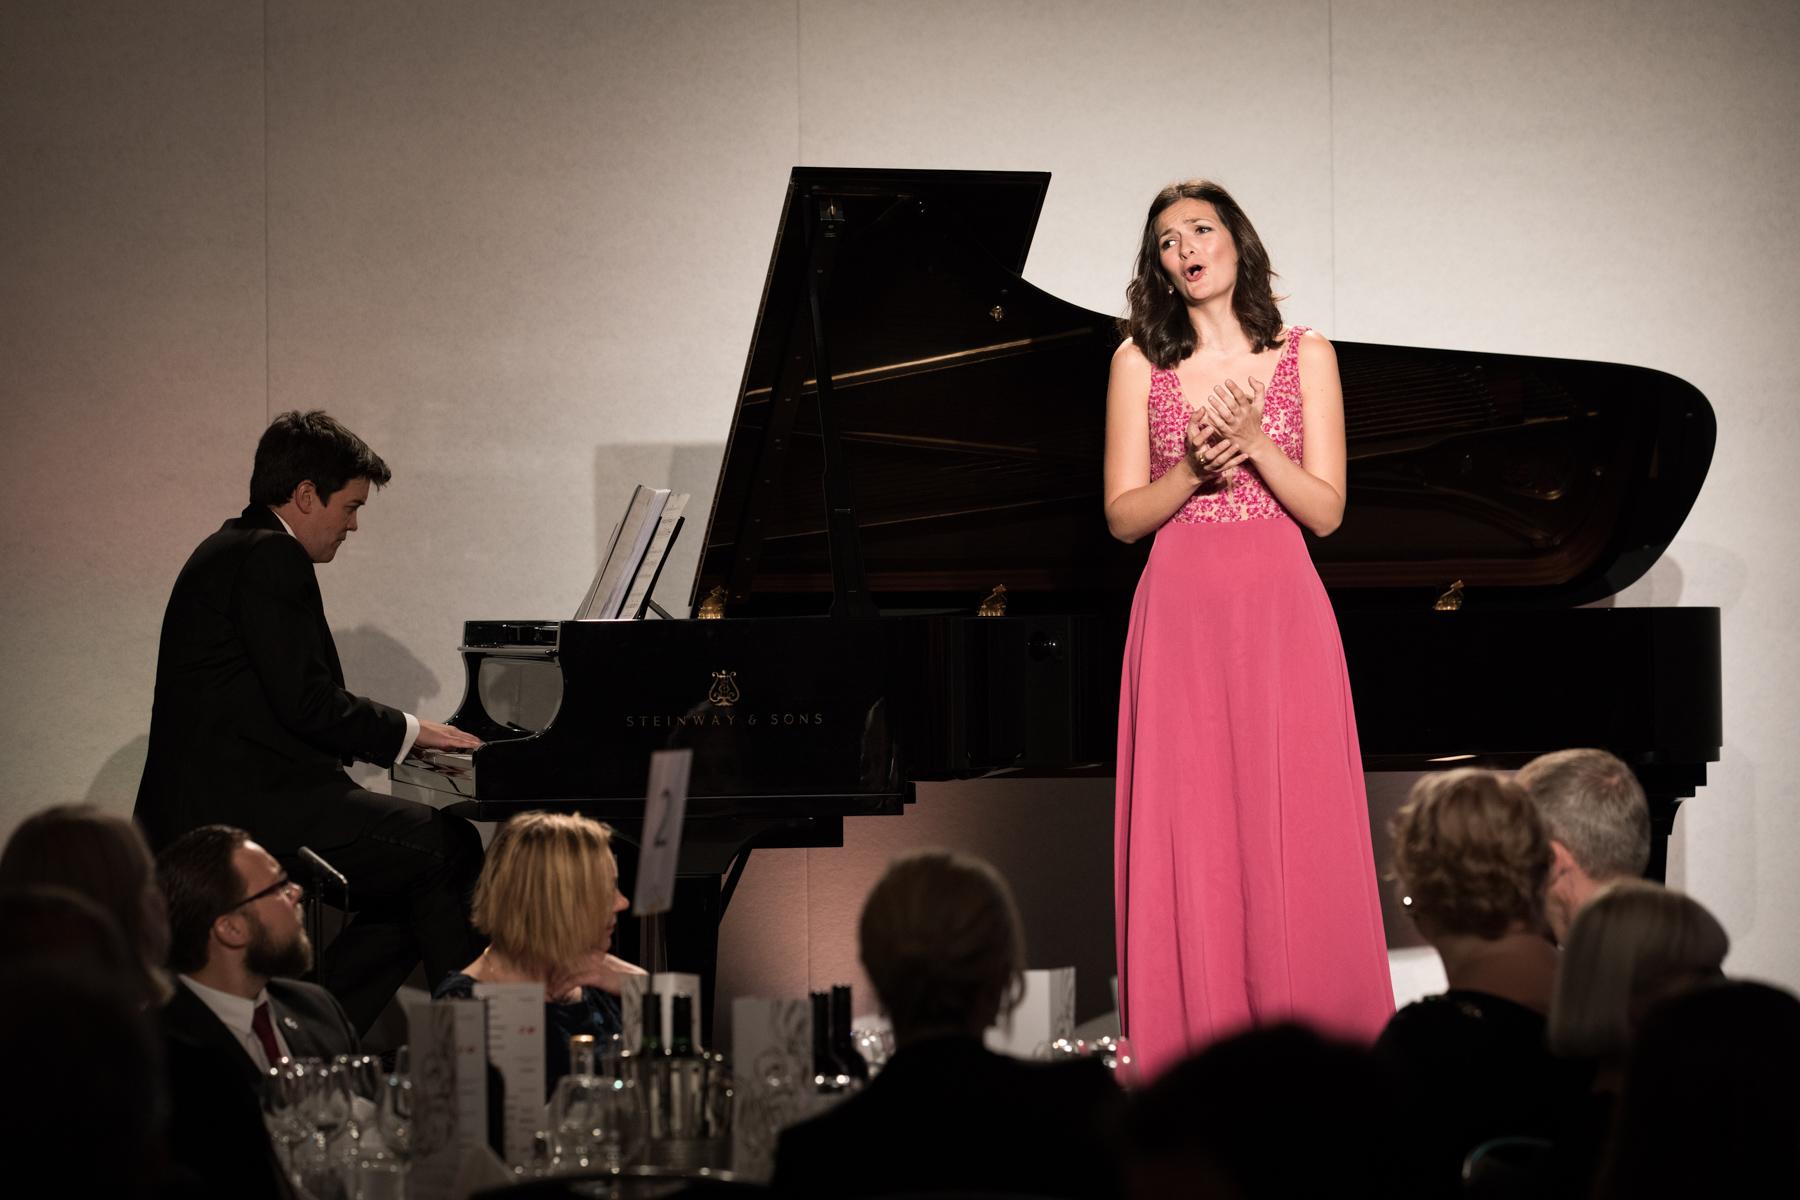 The Solo Vocal Award-winner Marianne Crebassa, accompanied by James Baillieu